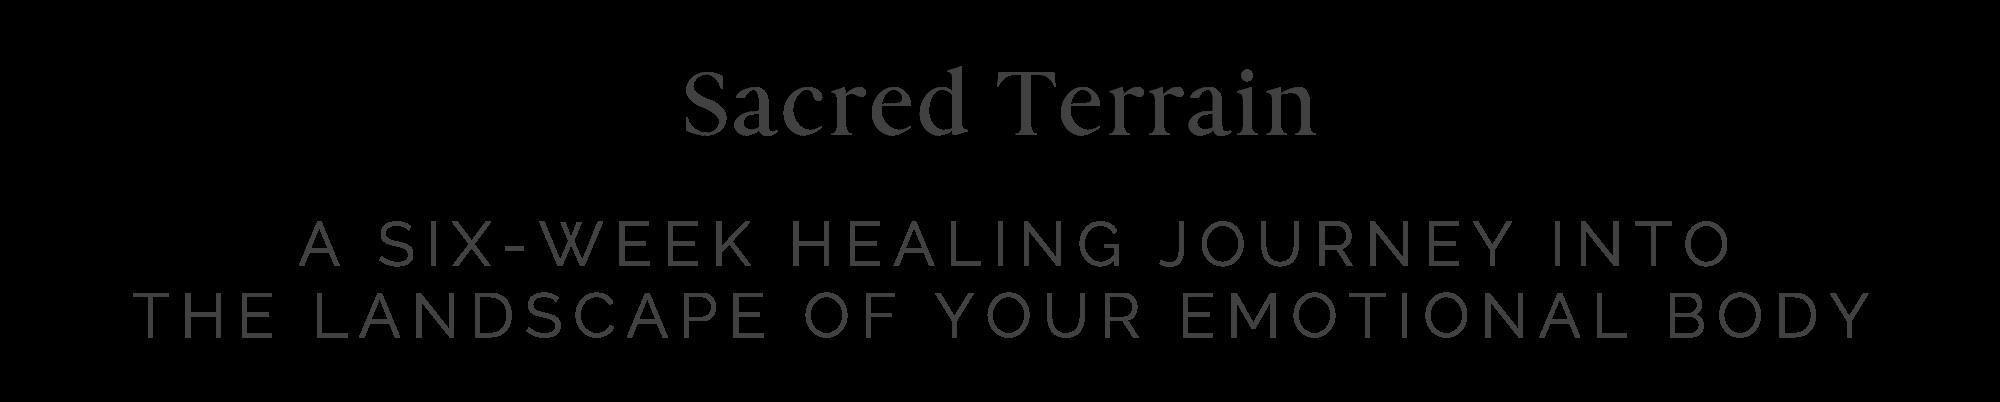 Sacred-Terrain-Title-no-logo.png